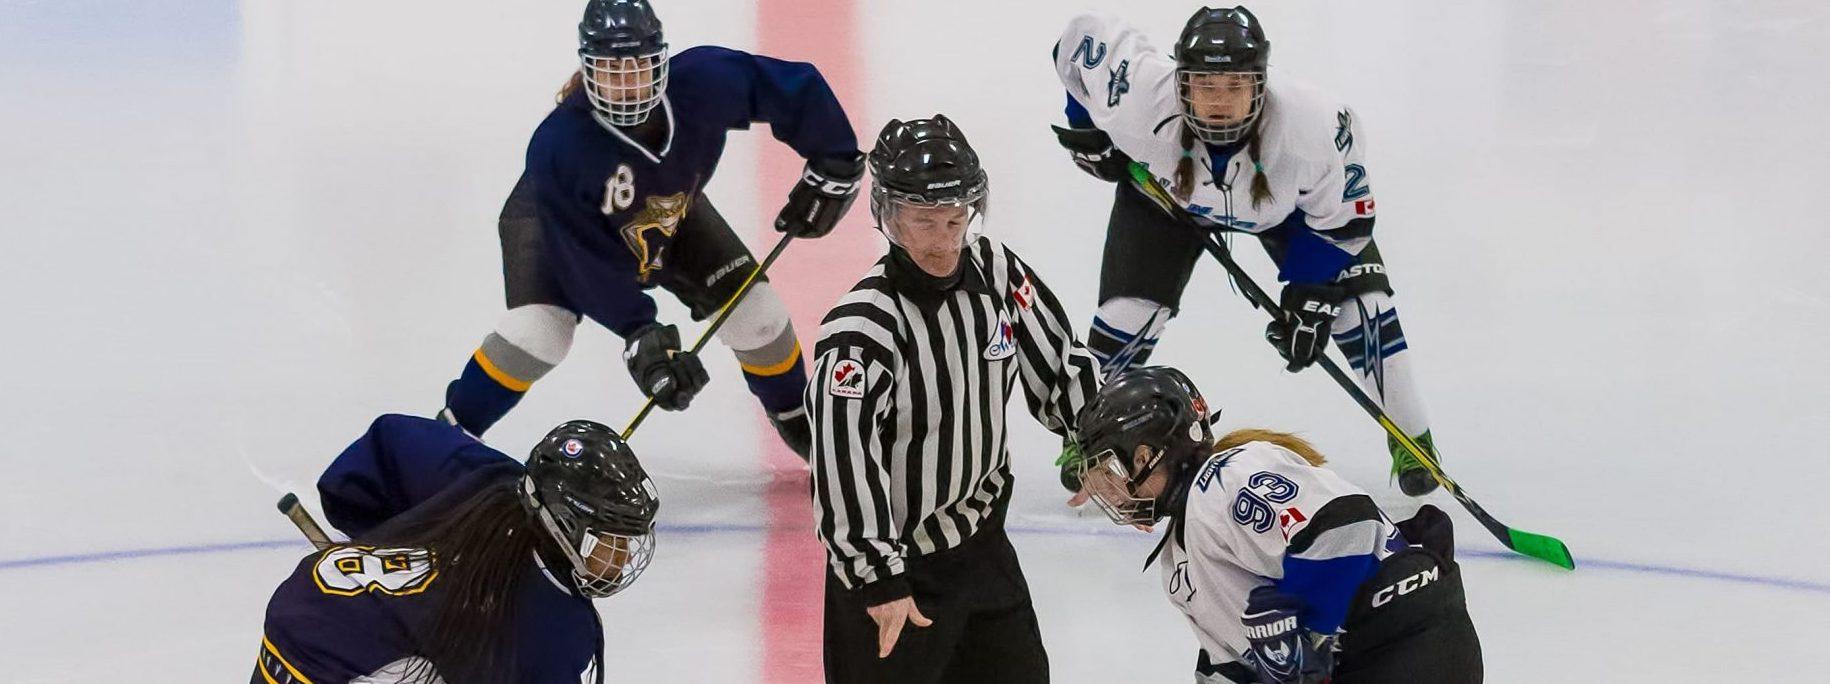 Методика «Антимартингейл» в ставках на хоккей